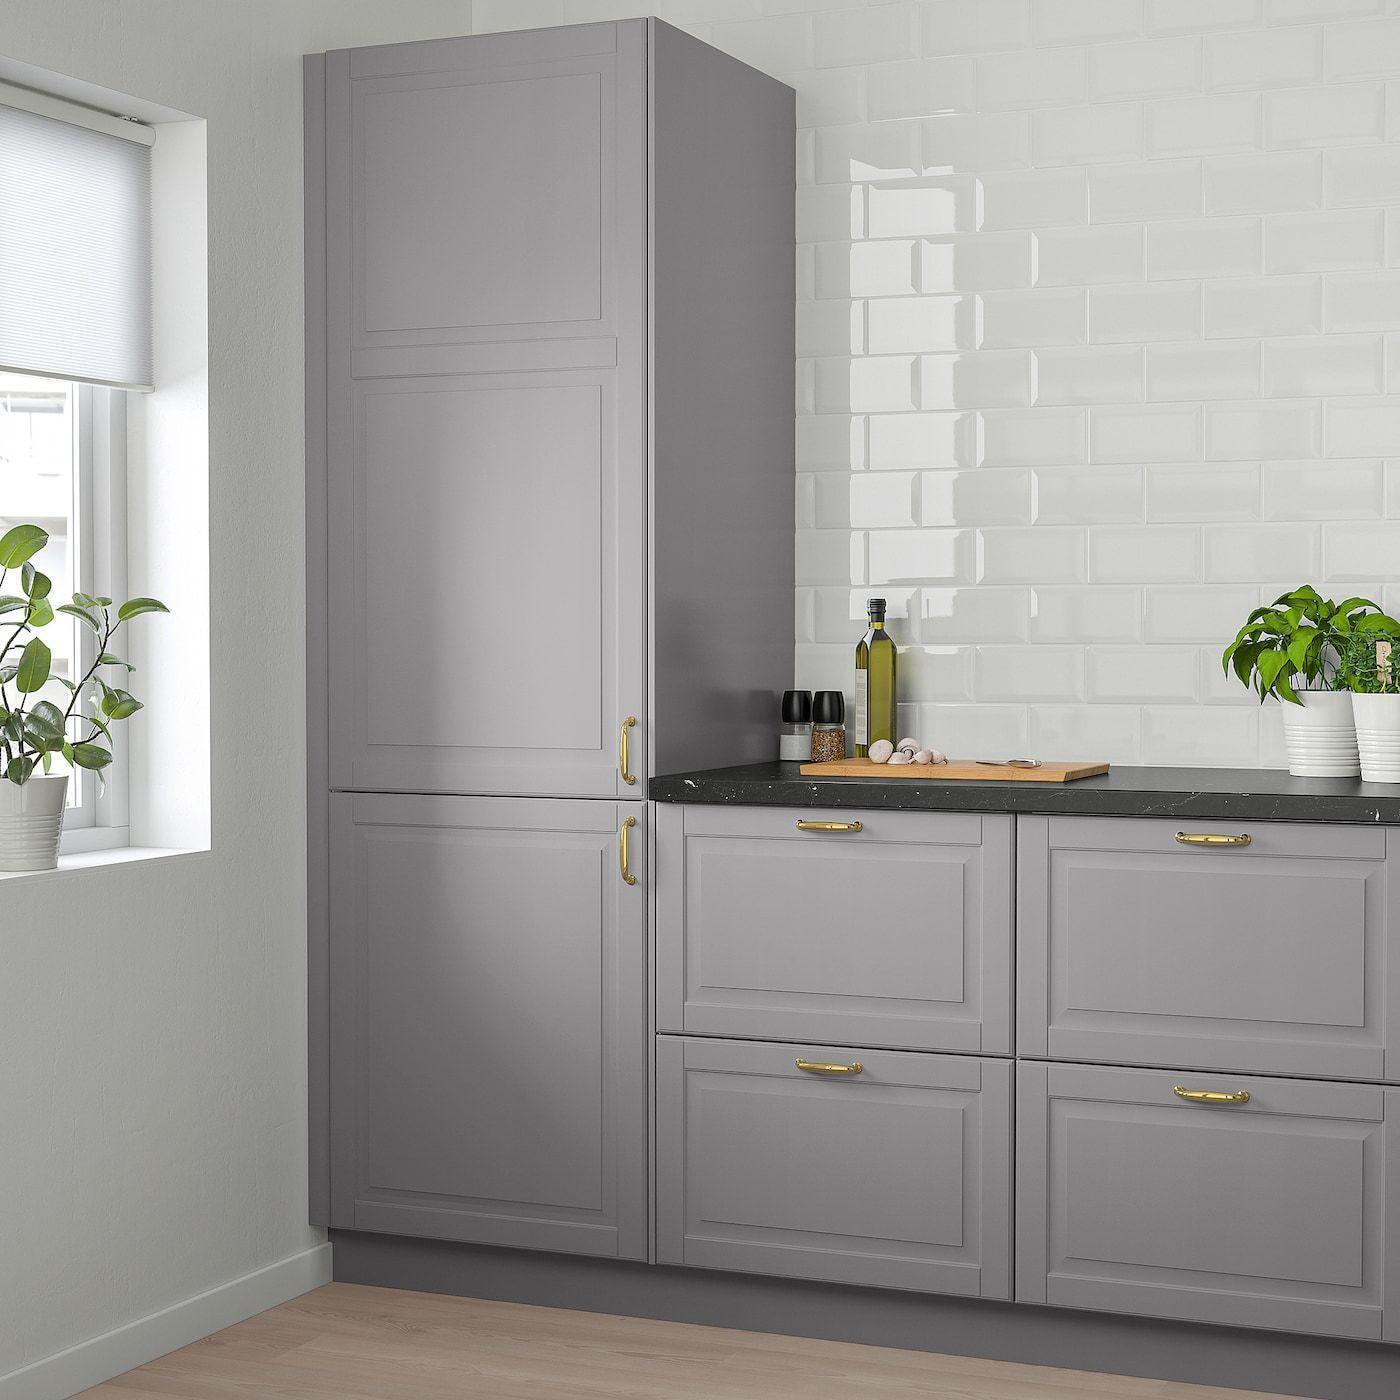 "BODBYN Door gray 15x30 "" in 2020 Ikea kitchen"